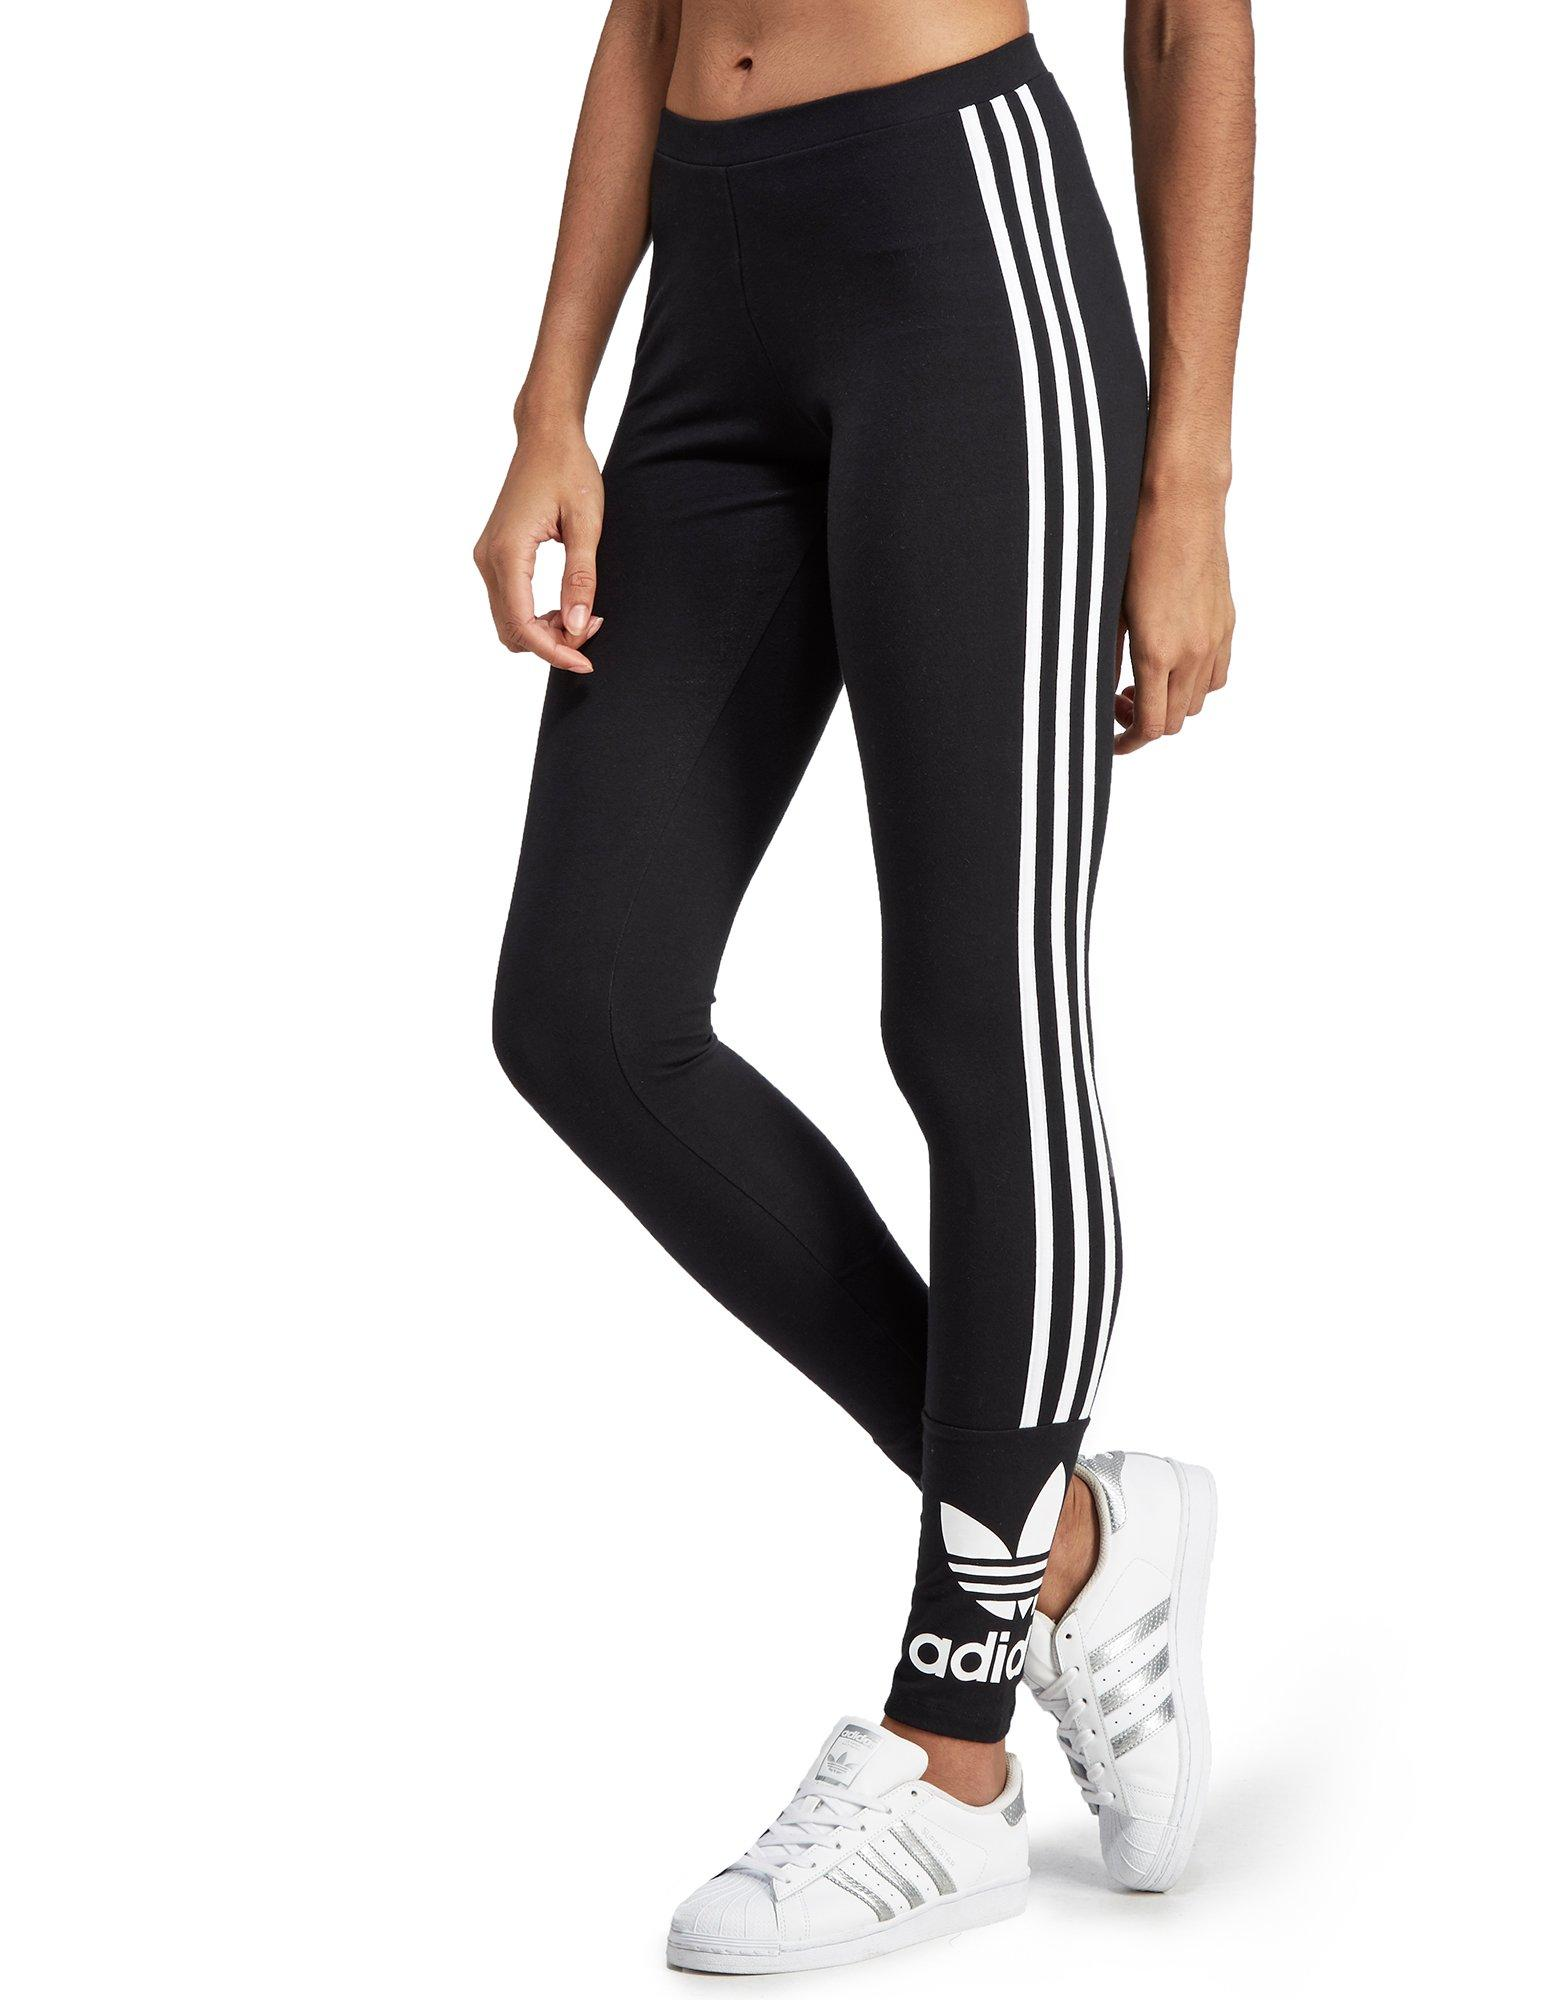 trifoglio leggings 3 stripes adidas